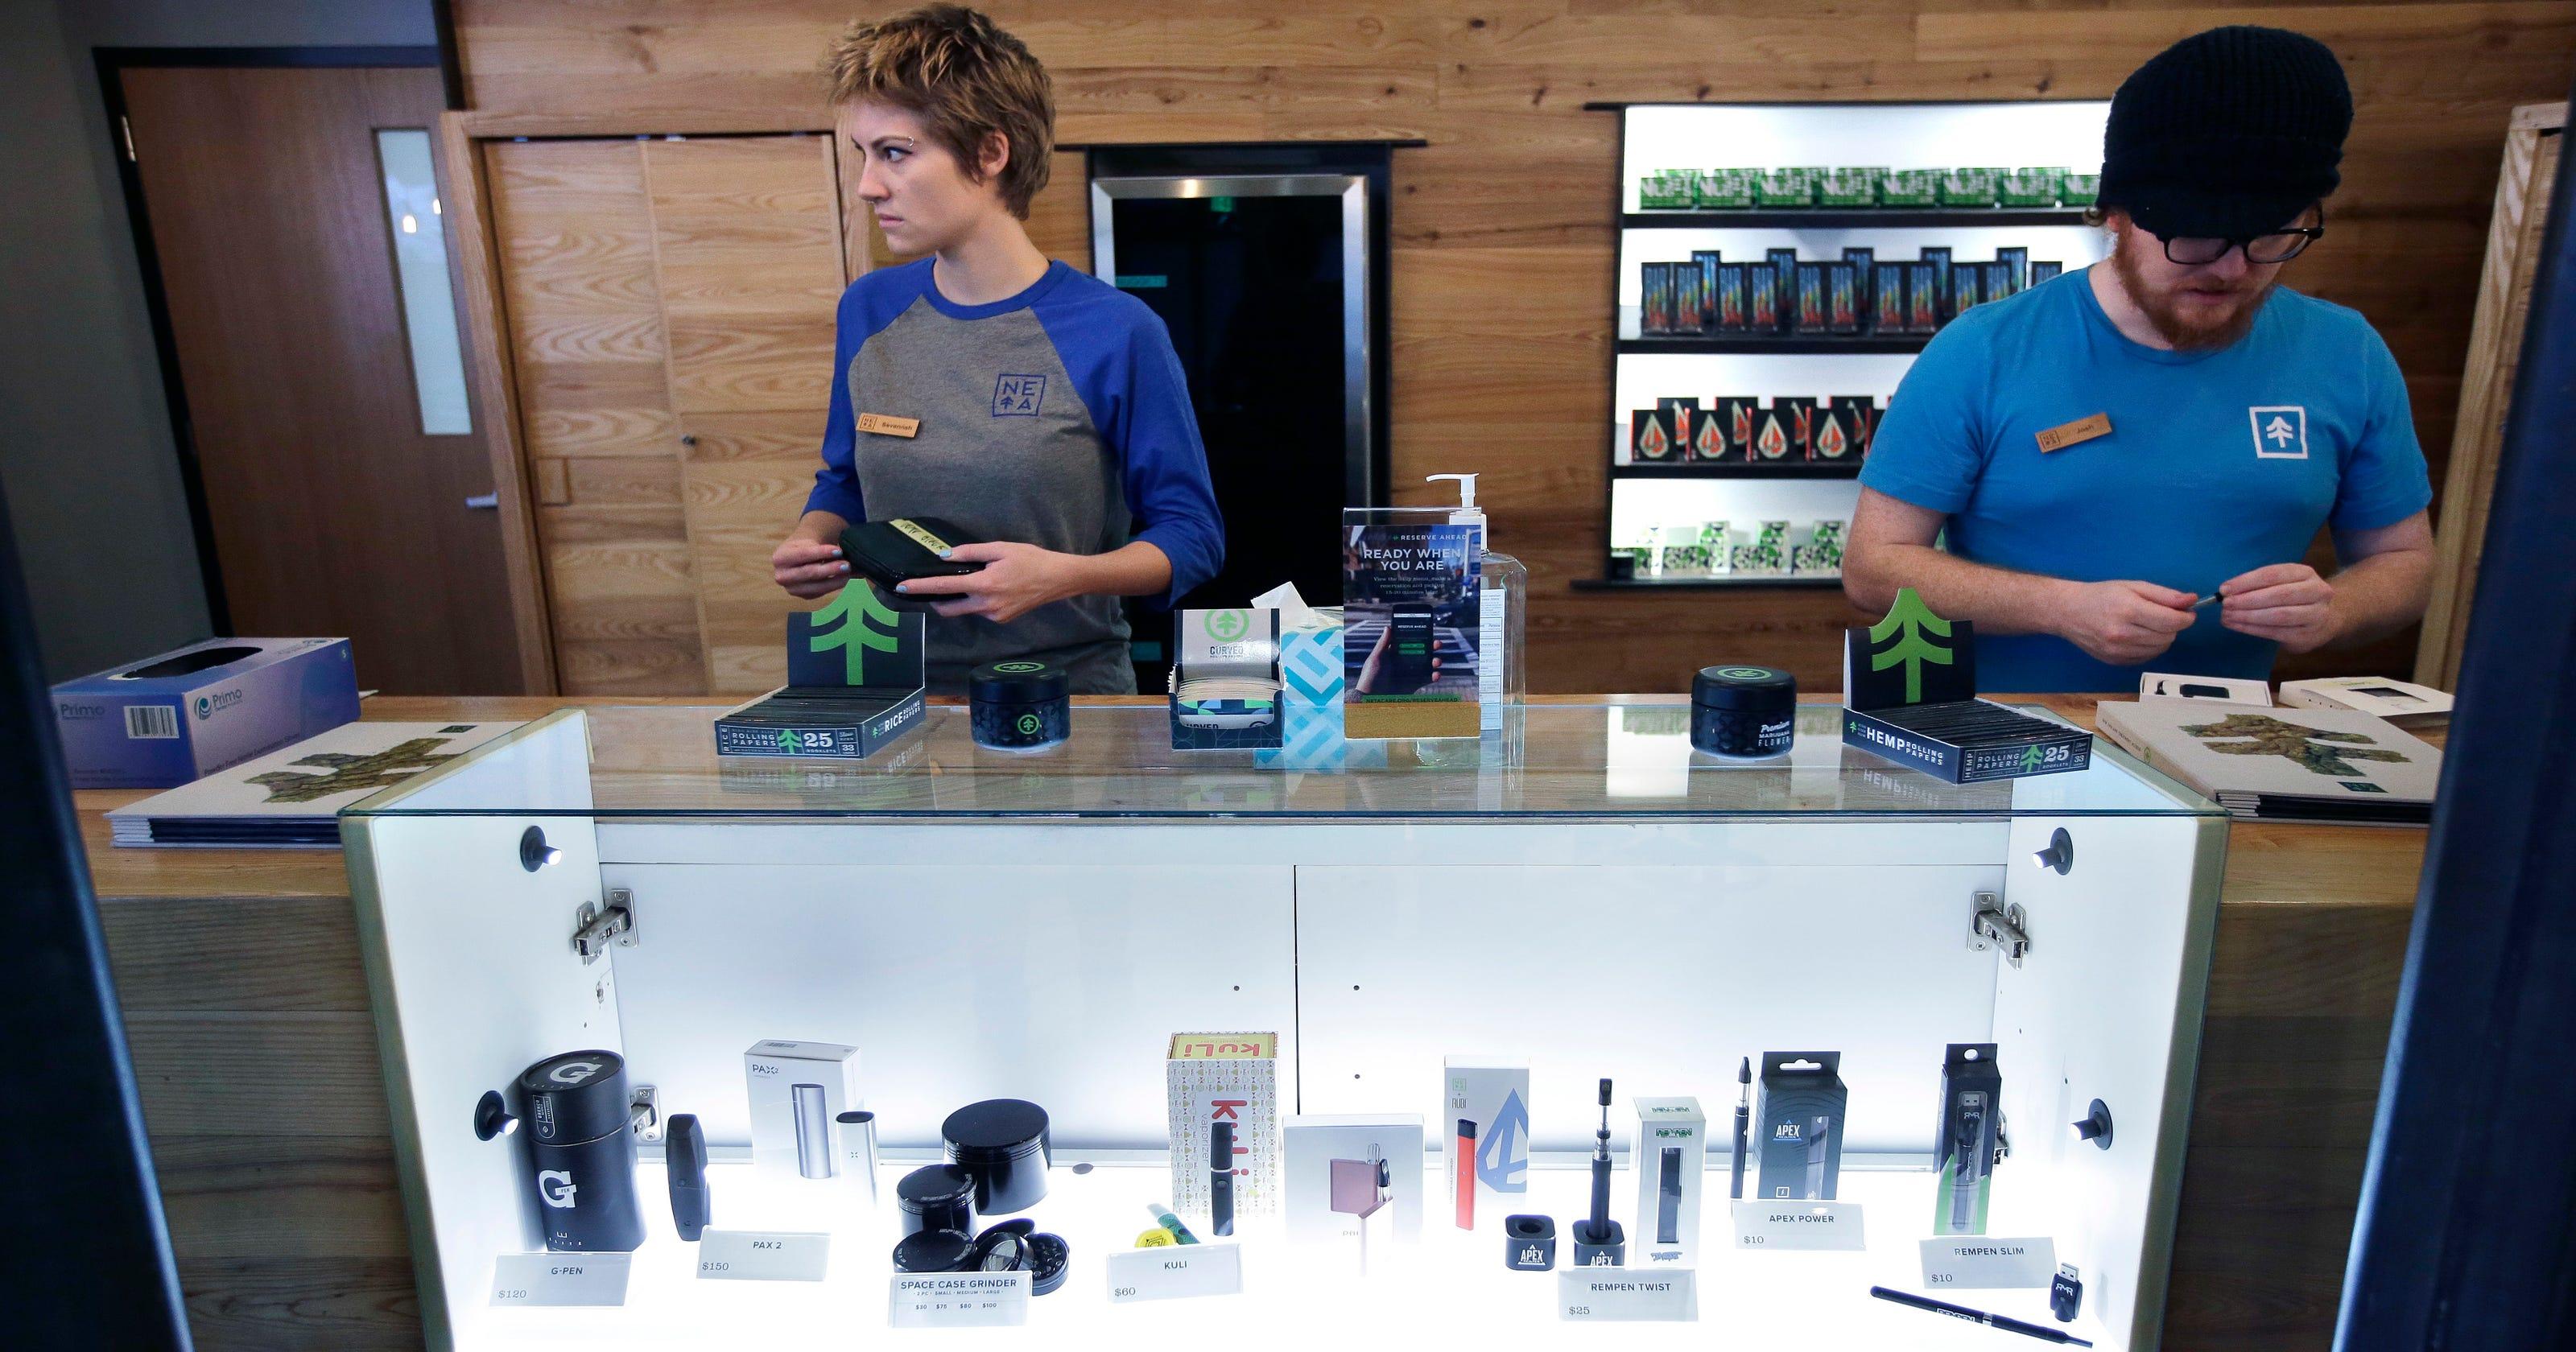 Marijuana in Massachusetts: Recreational pot shops set to open